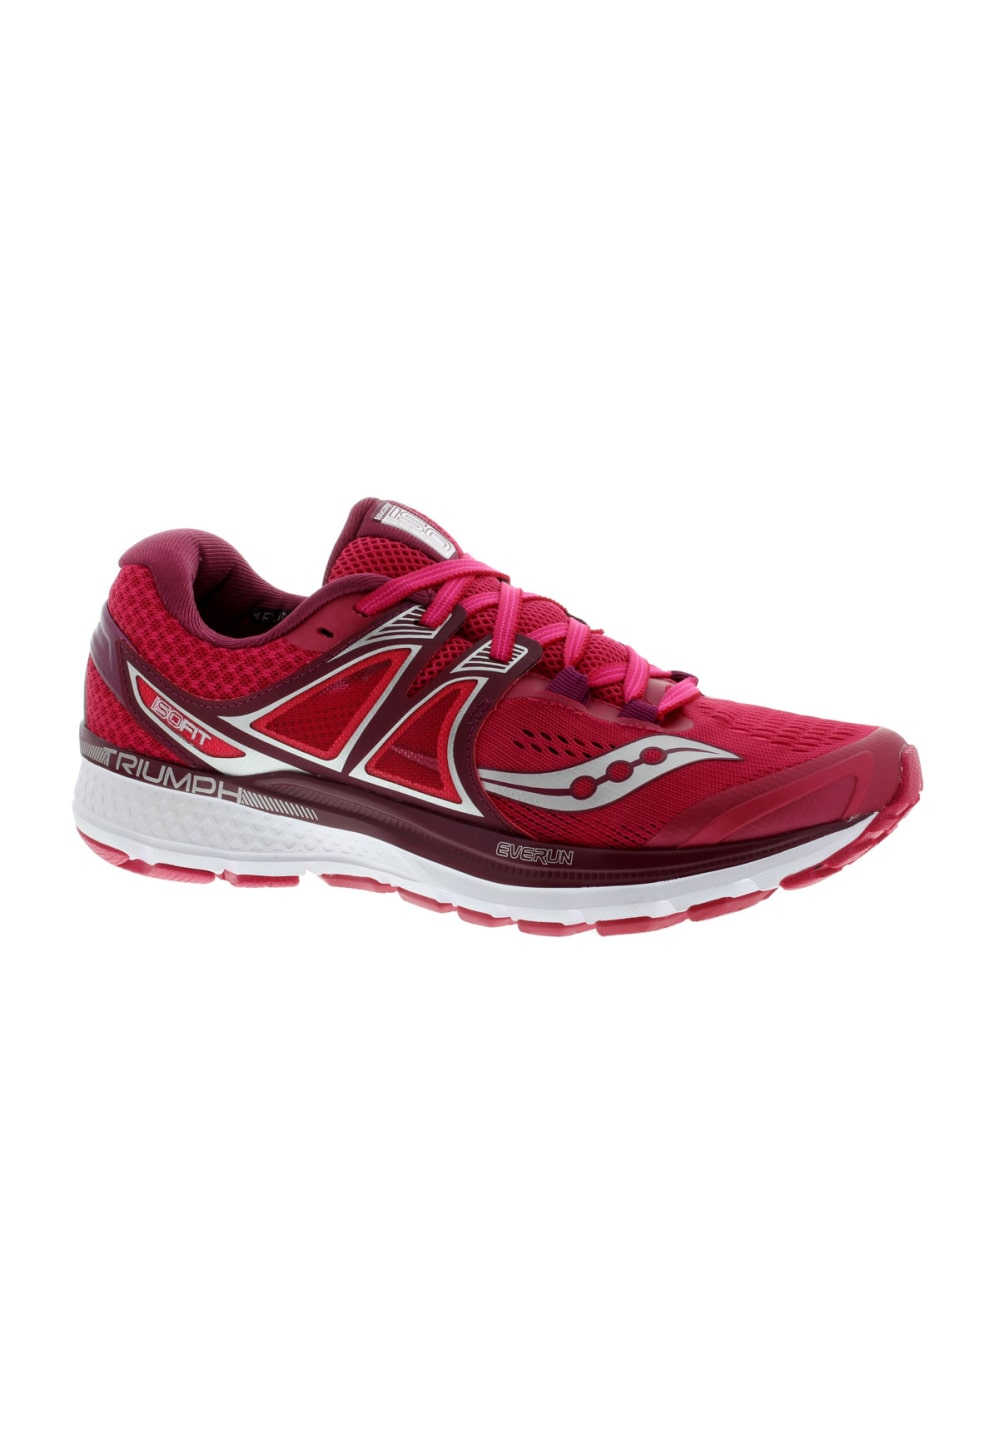 Saucony TRIUMPH ISO 3 - Chaussures de running neutres rouge